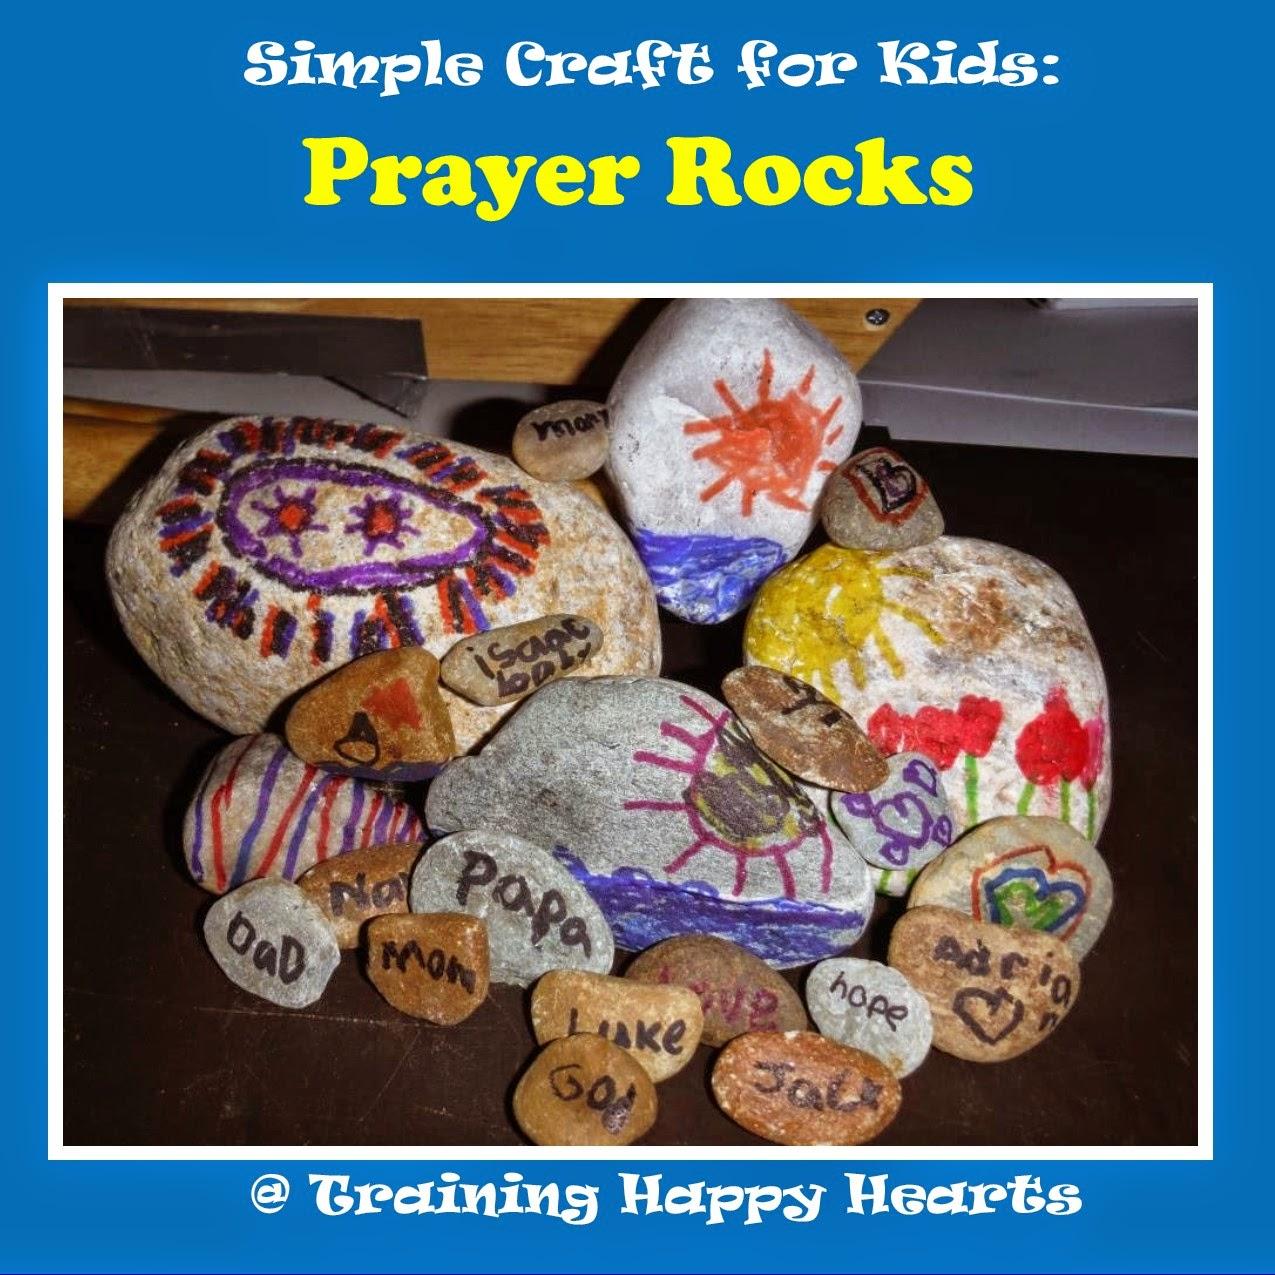 http://traininghappyhearts.blogspot.com/2015/04/a-simple-fun-faith-craft-for-kids.html